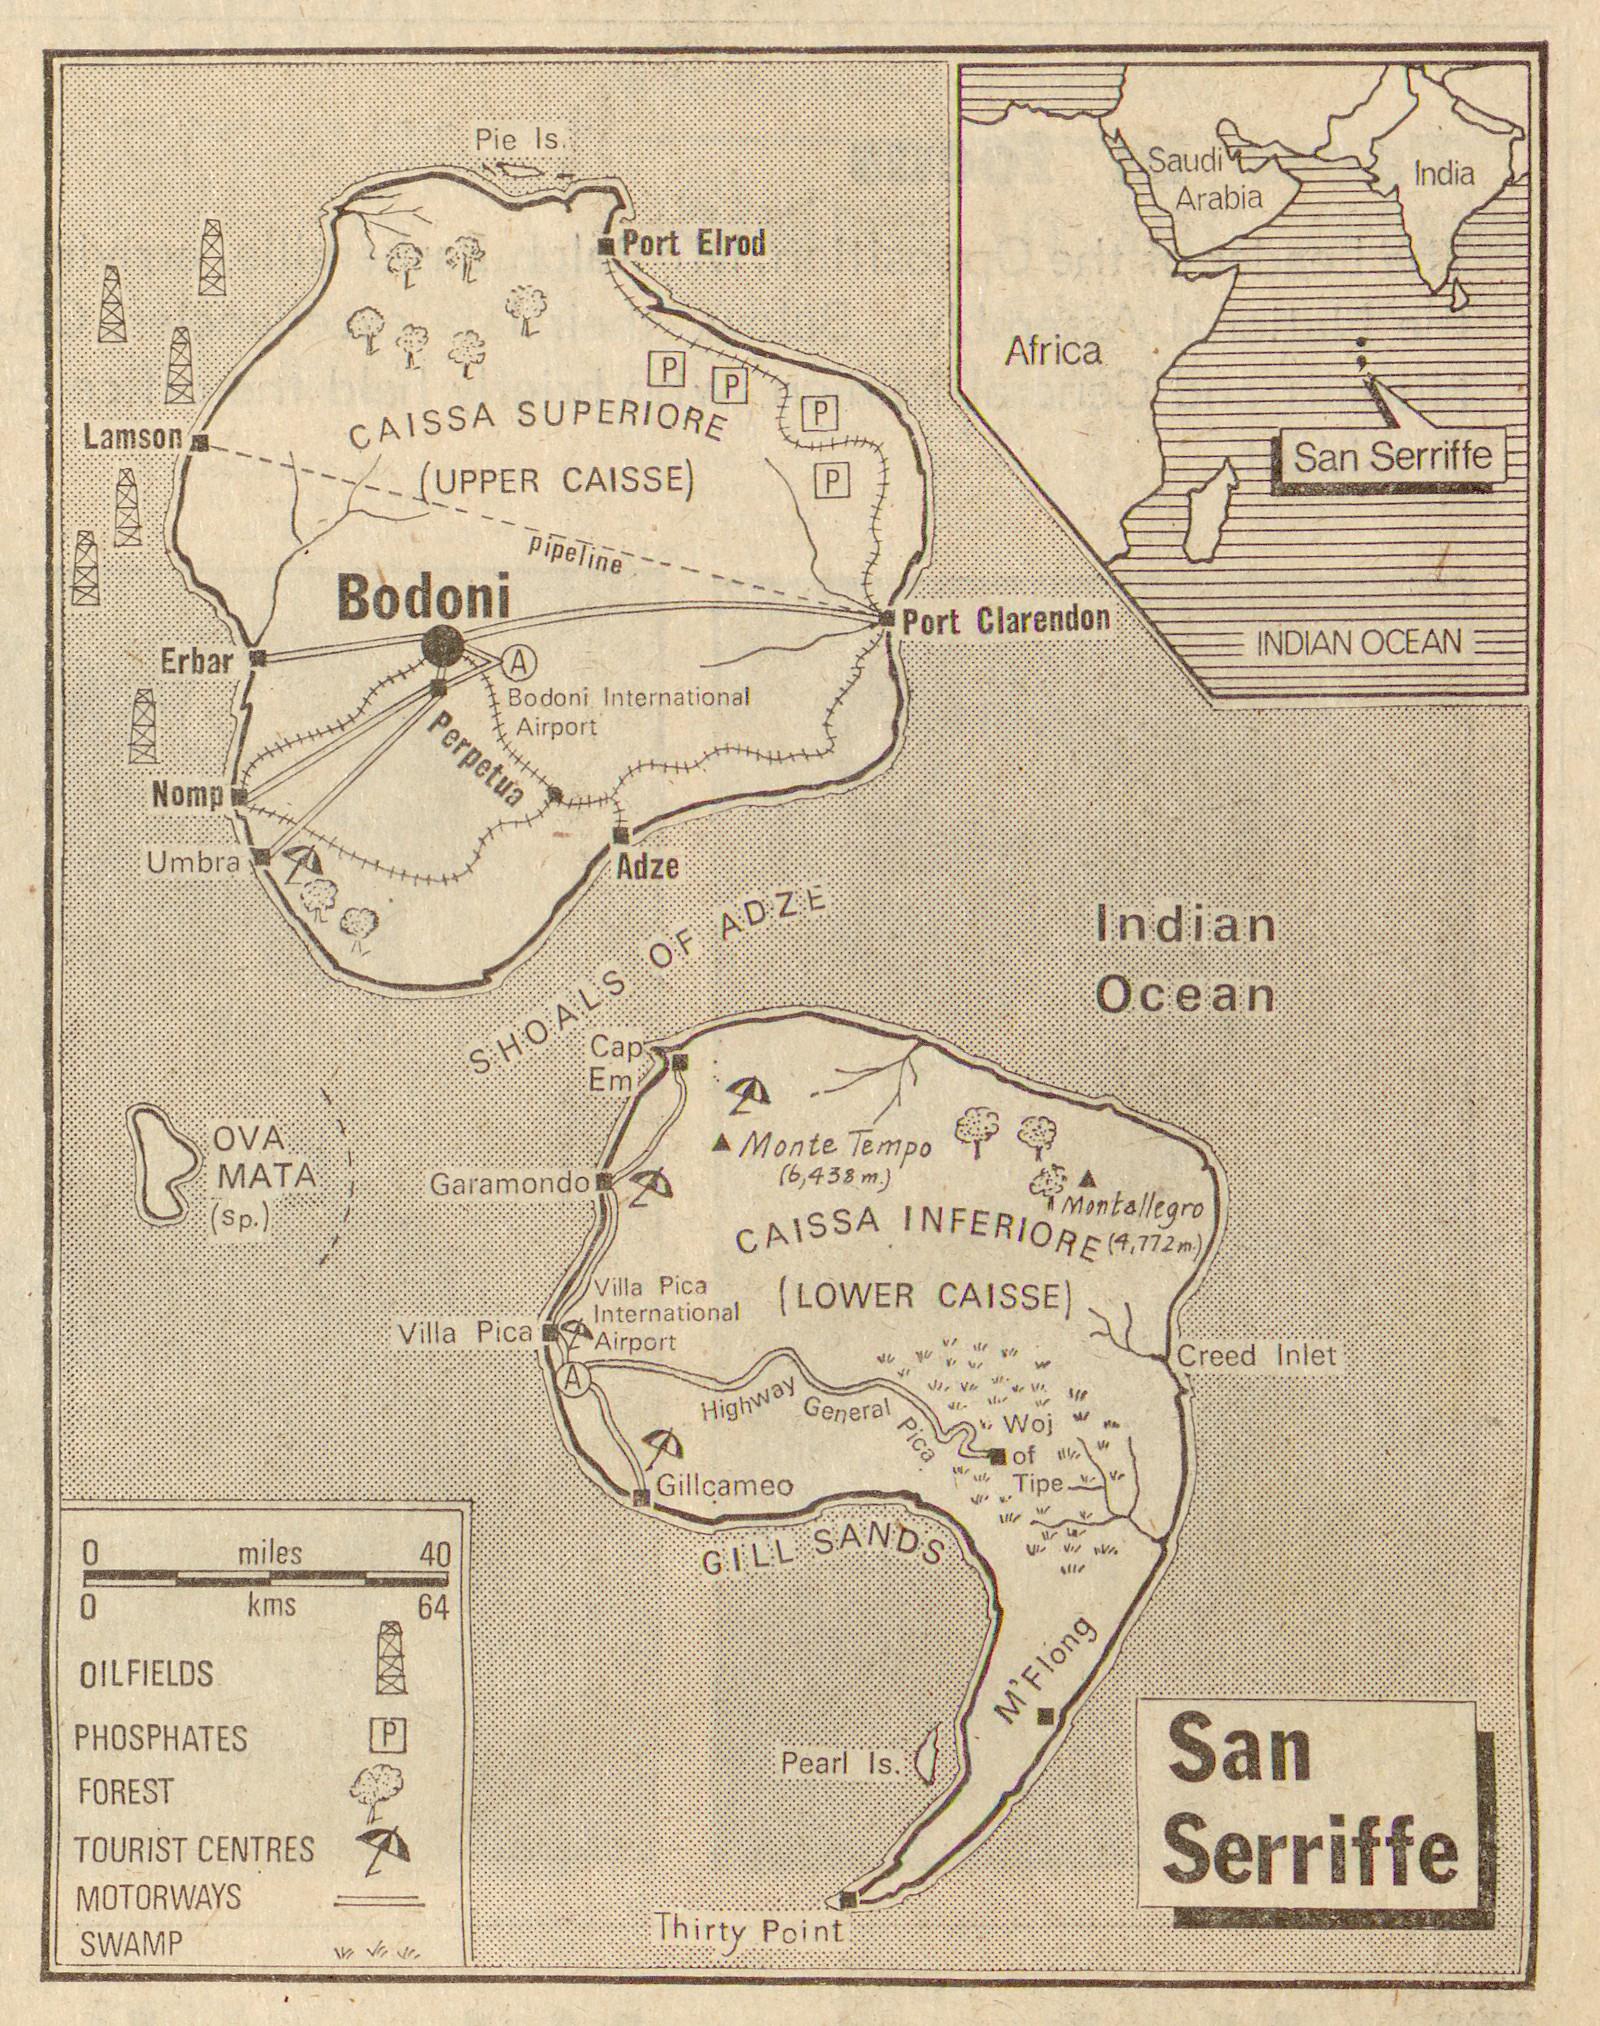 040119 bonus san serif island.jpeg